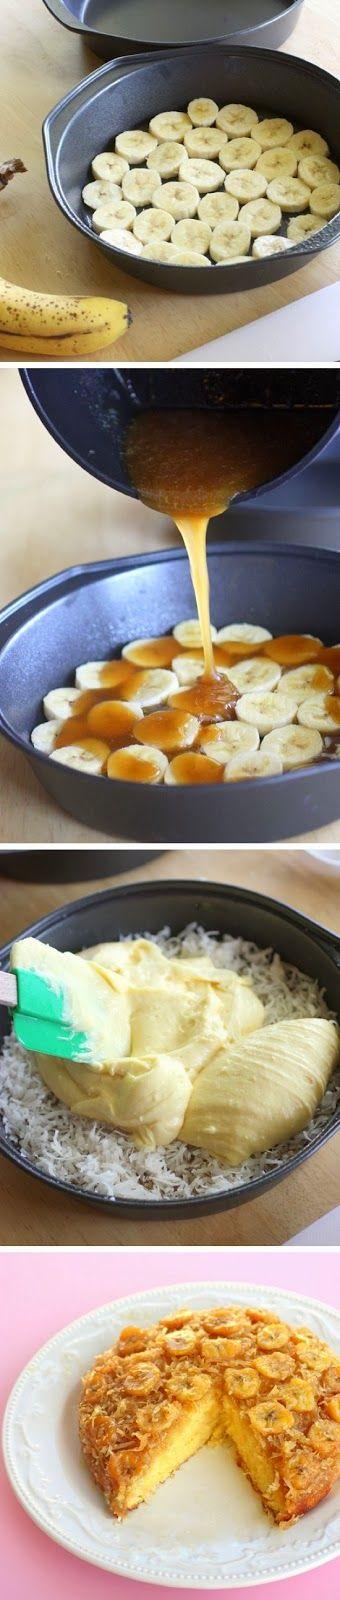 Banana Coconut Upside Down Cake | yummy | Pinterest